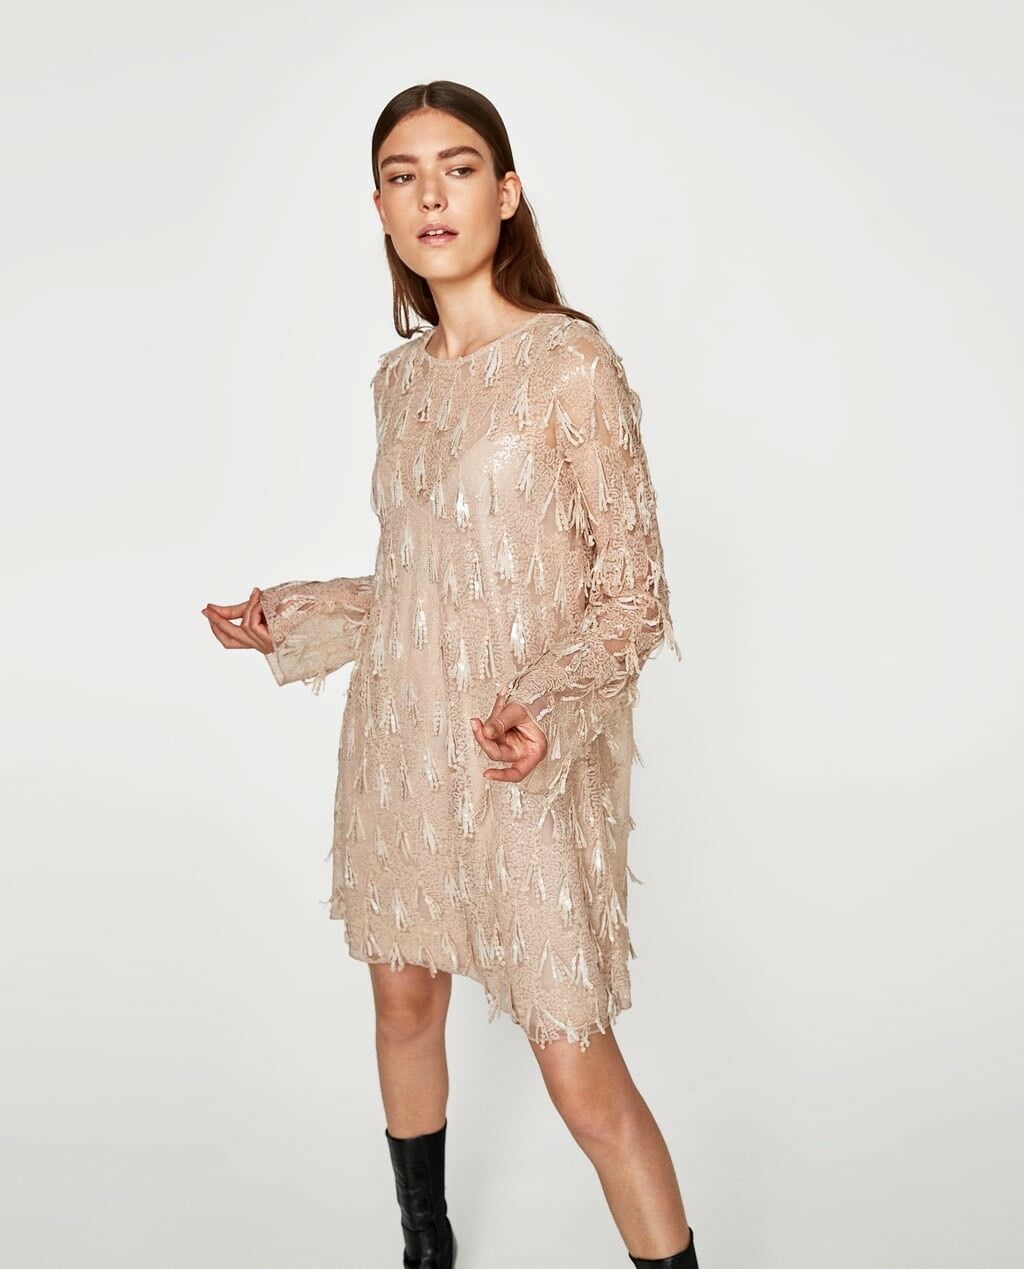 Zara damen Sequin Dress Pale Rosa Größe M NWT